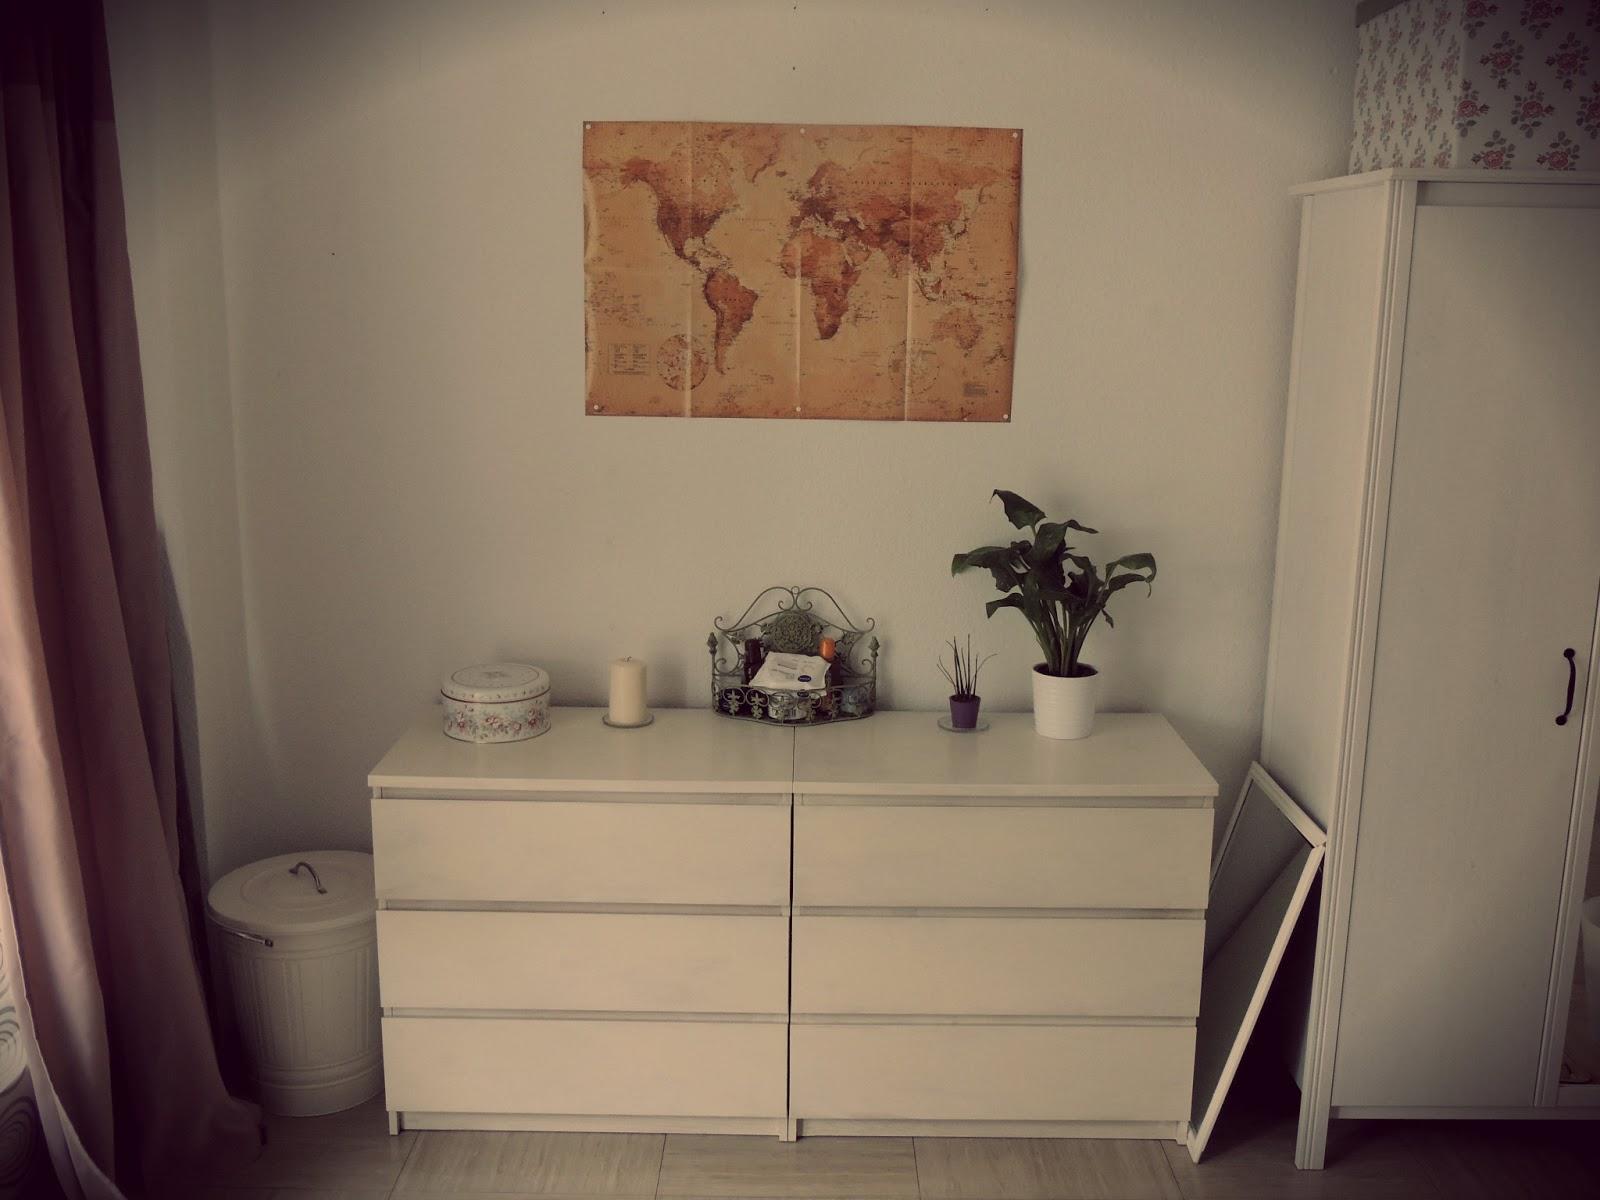 kommode f r meinen fernseher forum glamour. Black Bedroom Furniture Sets. Home Design Ideas